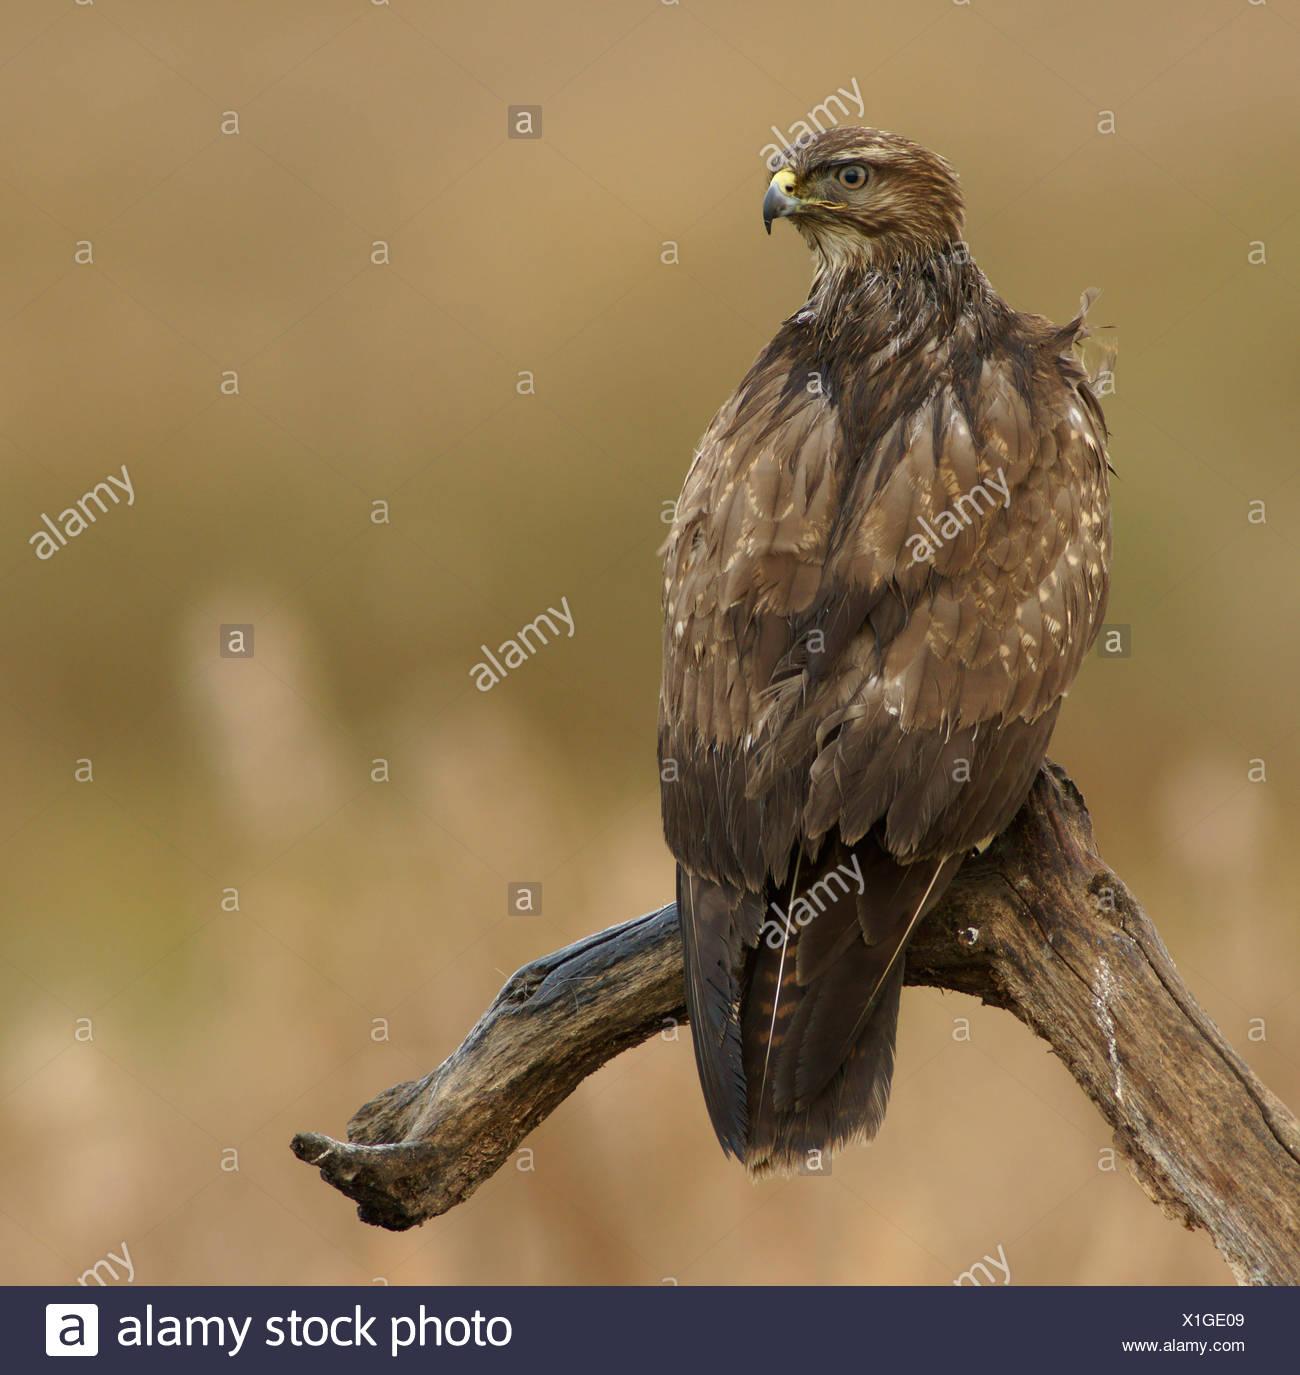 Common Buzzard (Buteo buteo), Feldberger Seen, lakes, Mecklenburg-Western Pomerania, Germany, Europe - Stock Image